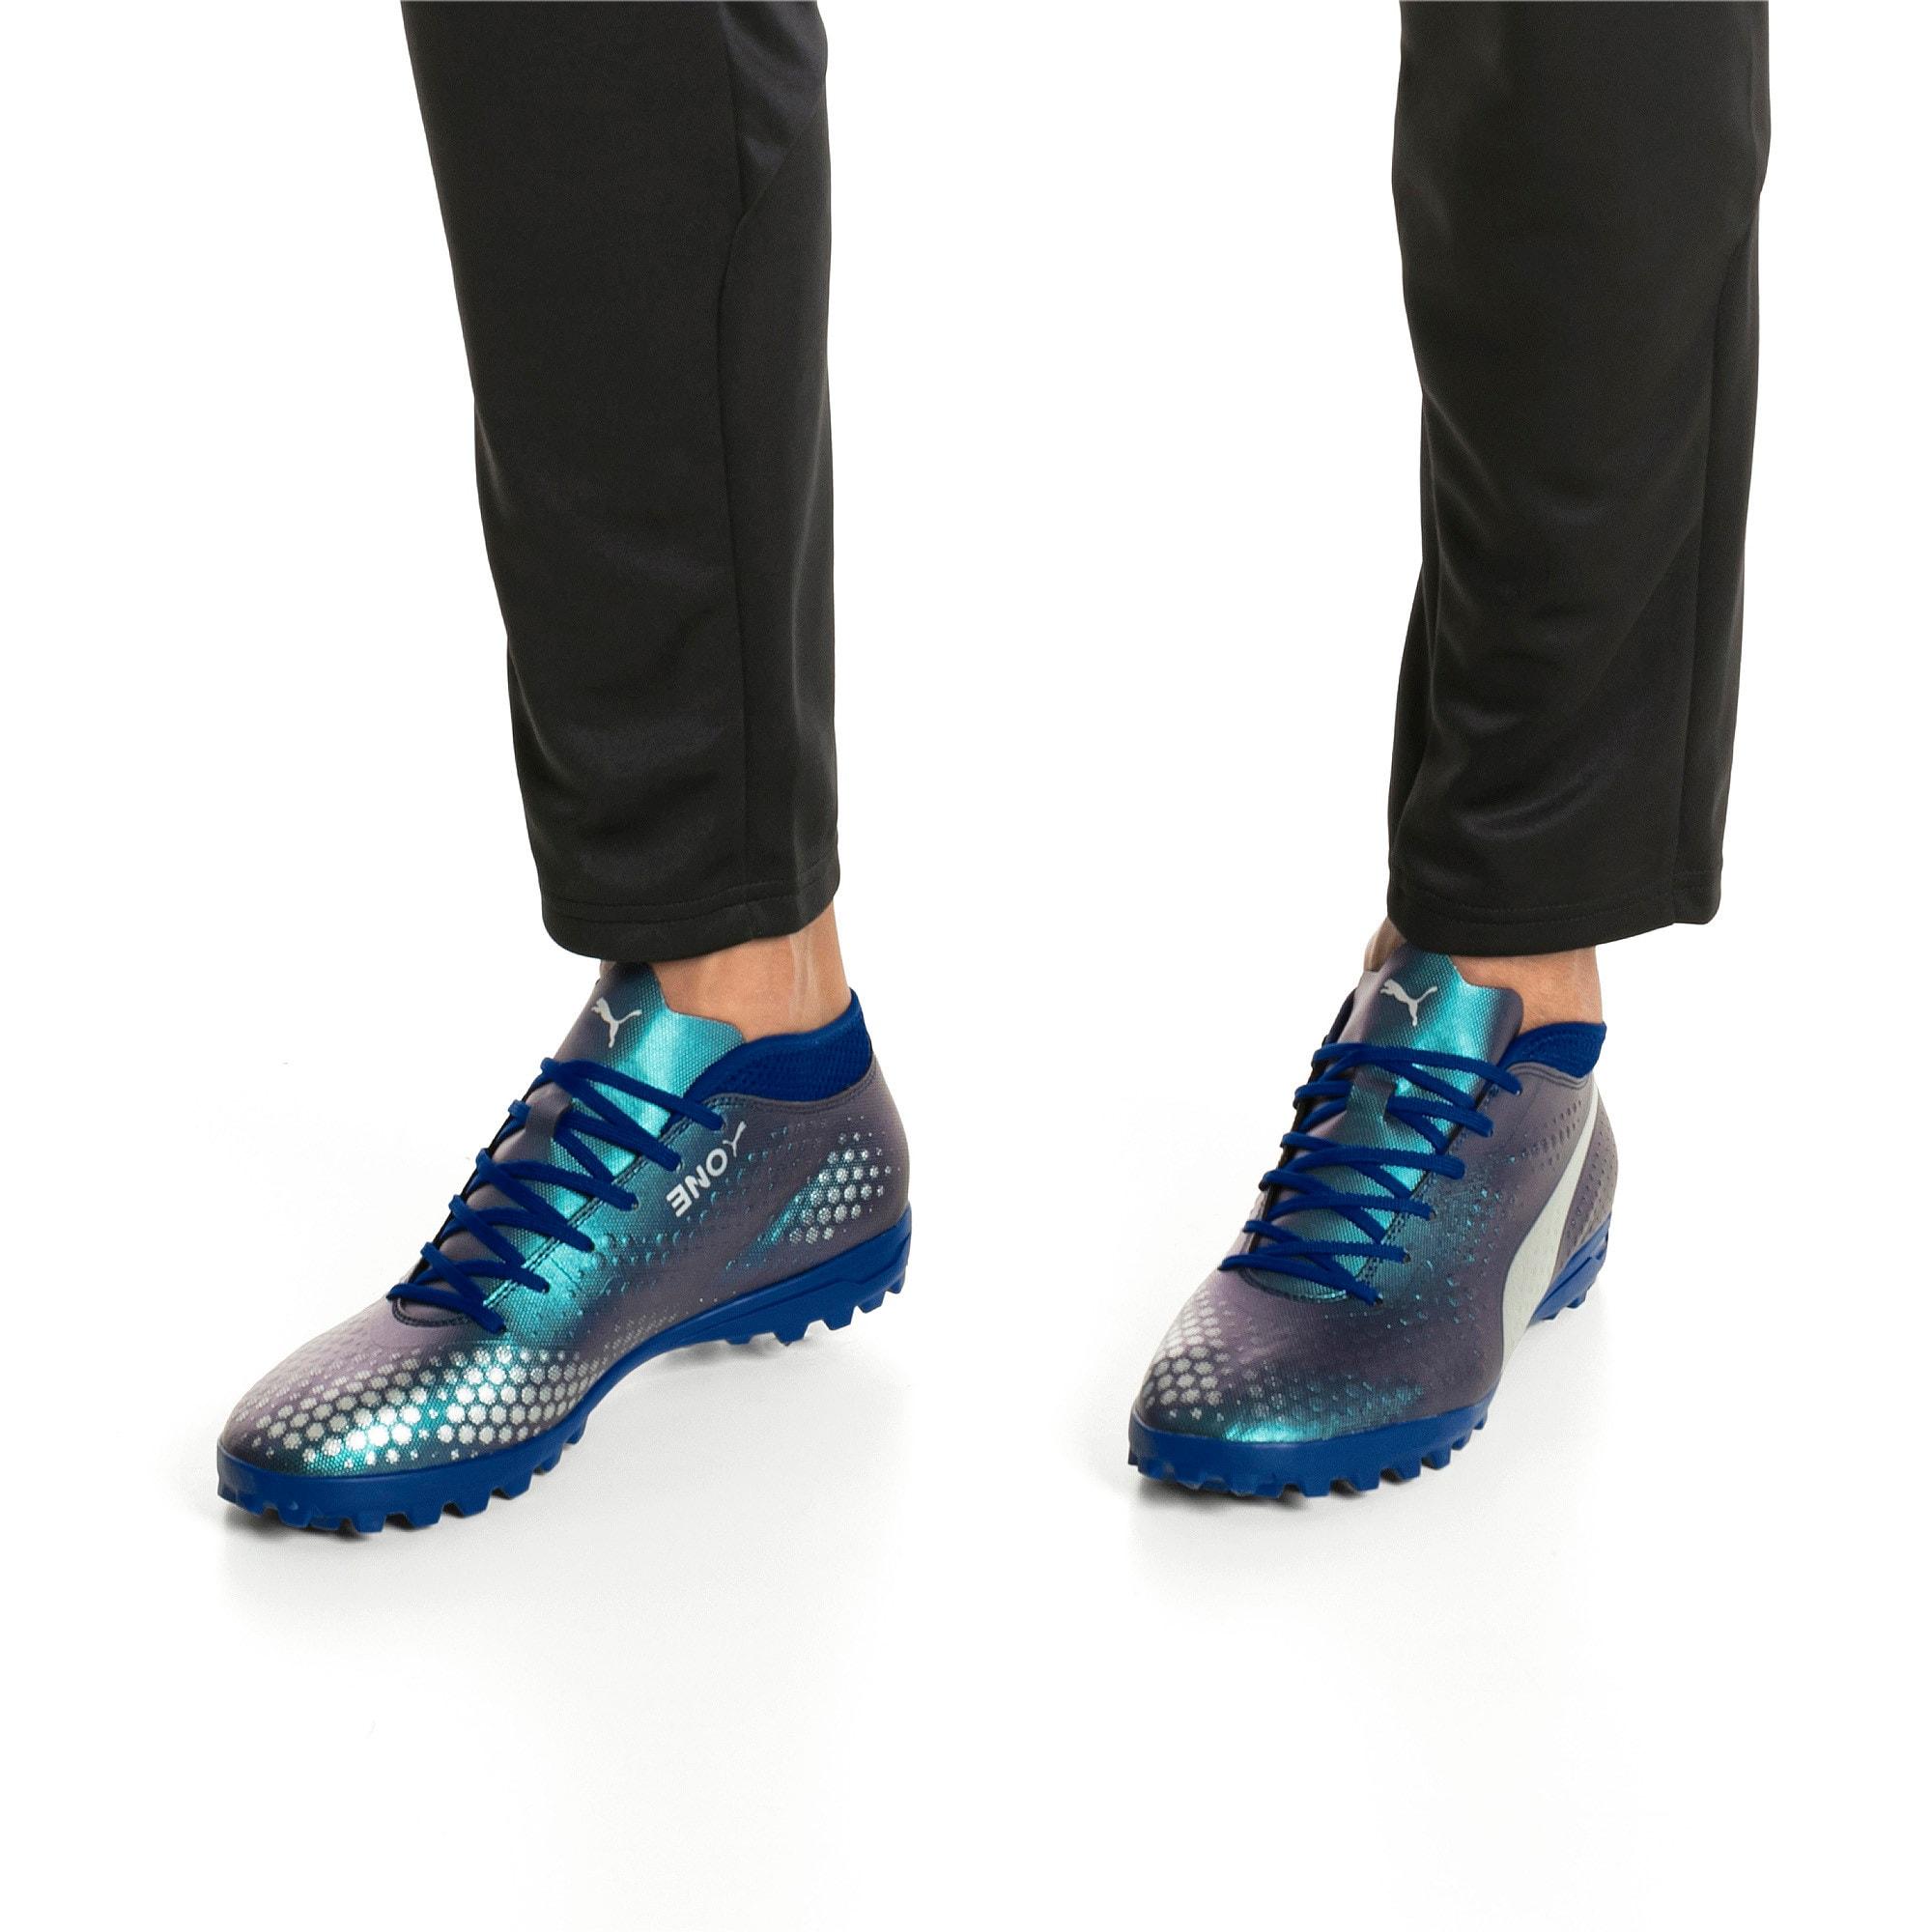 Thumbnail 7 of PUMA ONE 4 Synthetic TT Men's Football Boots, Sodalite Blue-Silver-Peacoat, medium-IND